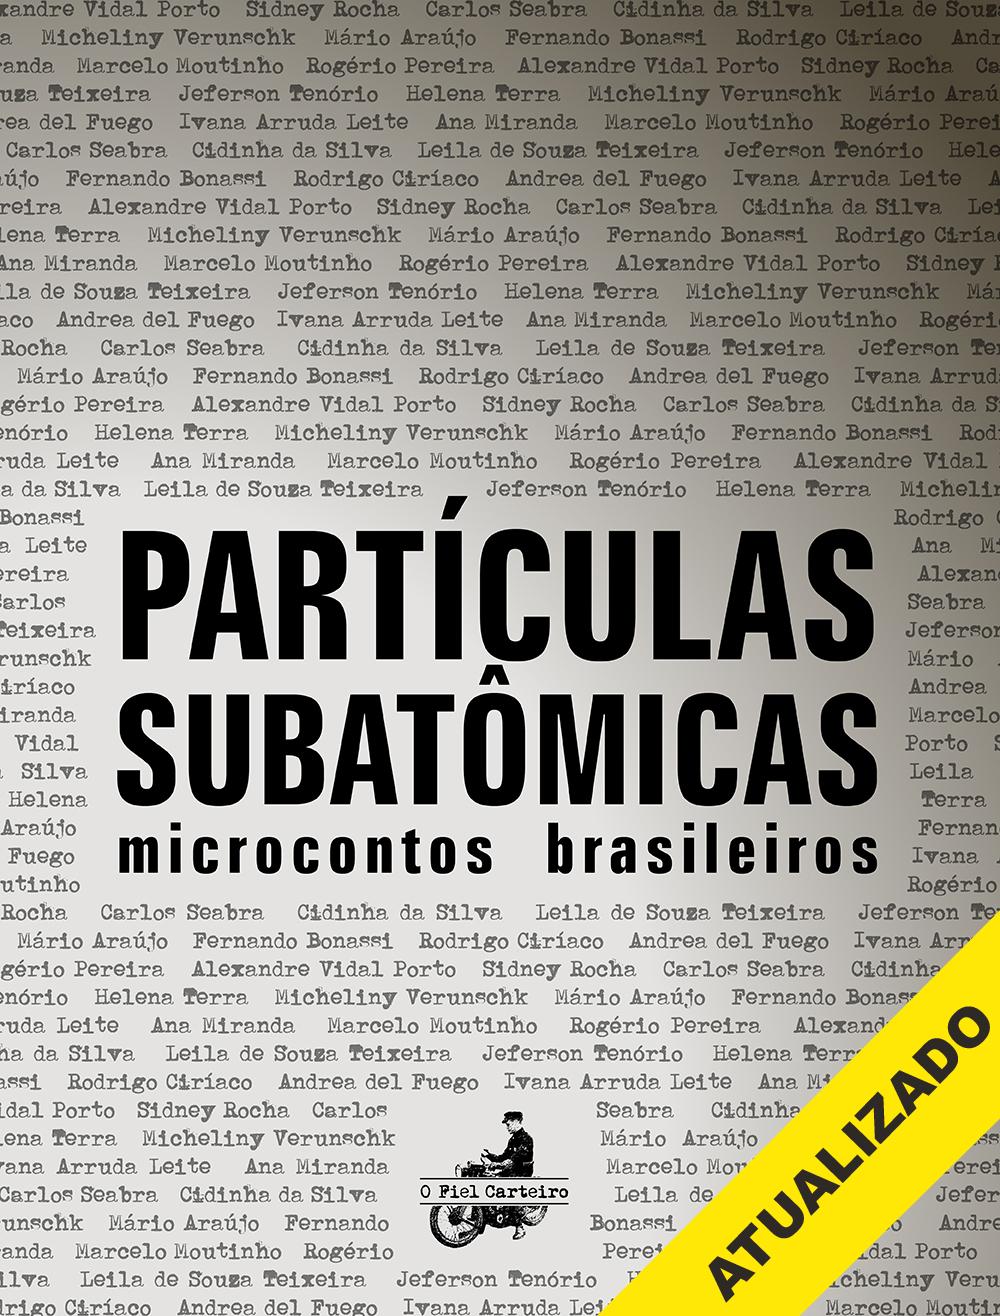 particulas subatomicas.jpg